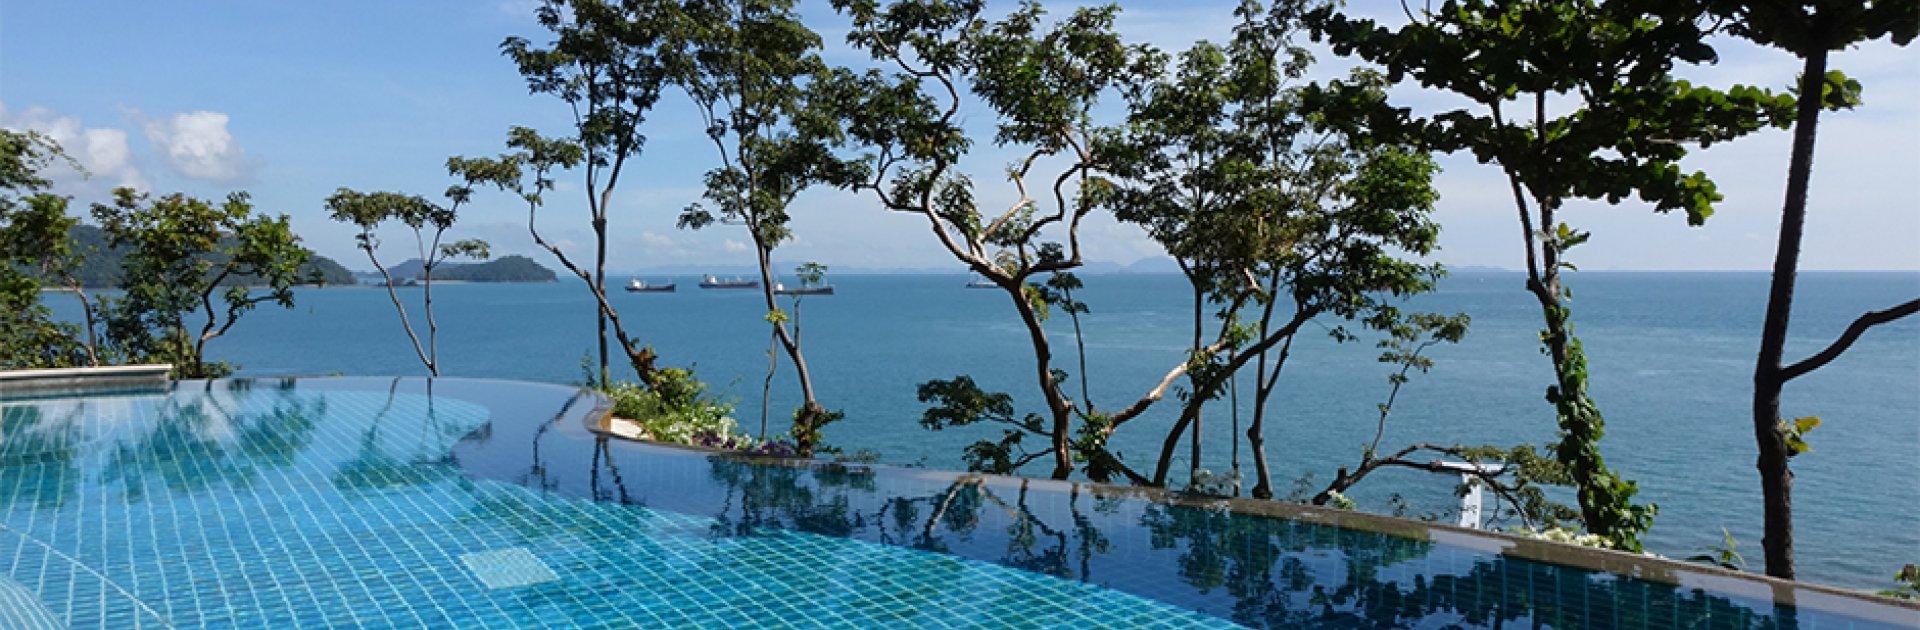 Ferienunterkünfte mit eigenem Pool